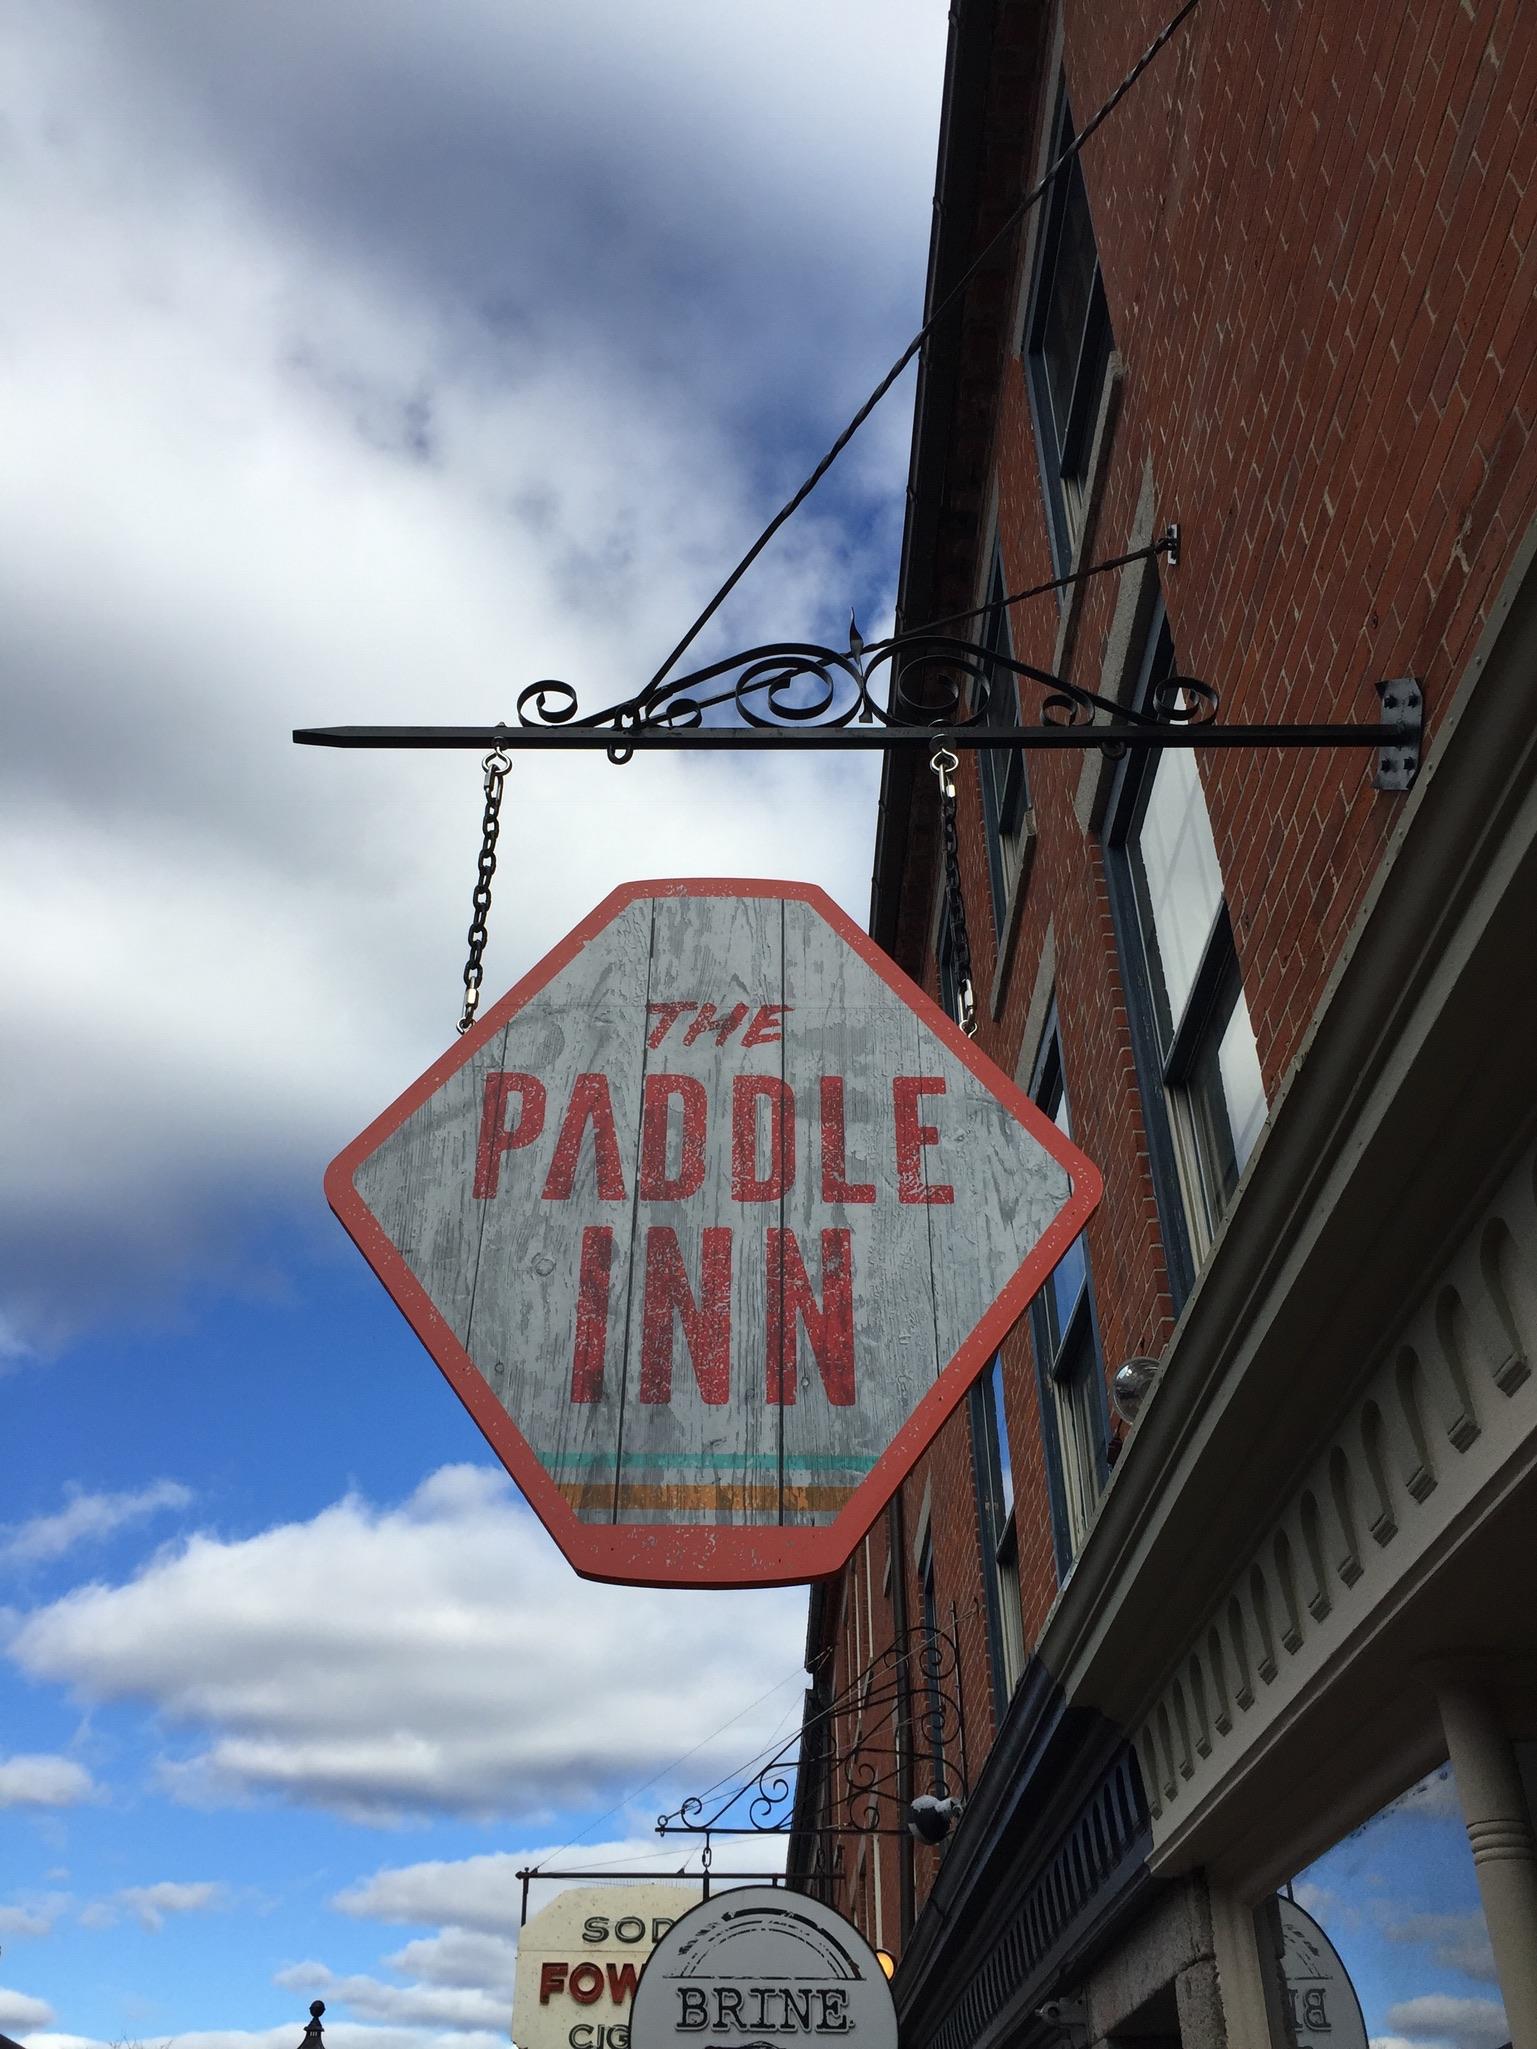 The Paddle Inn, Newburyport